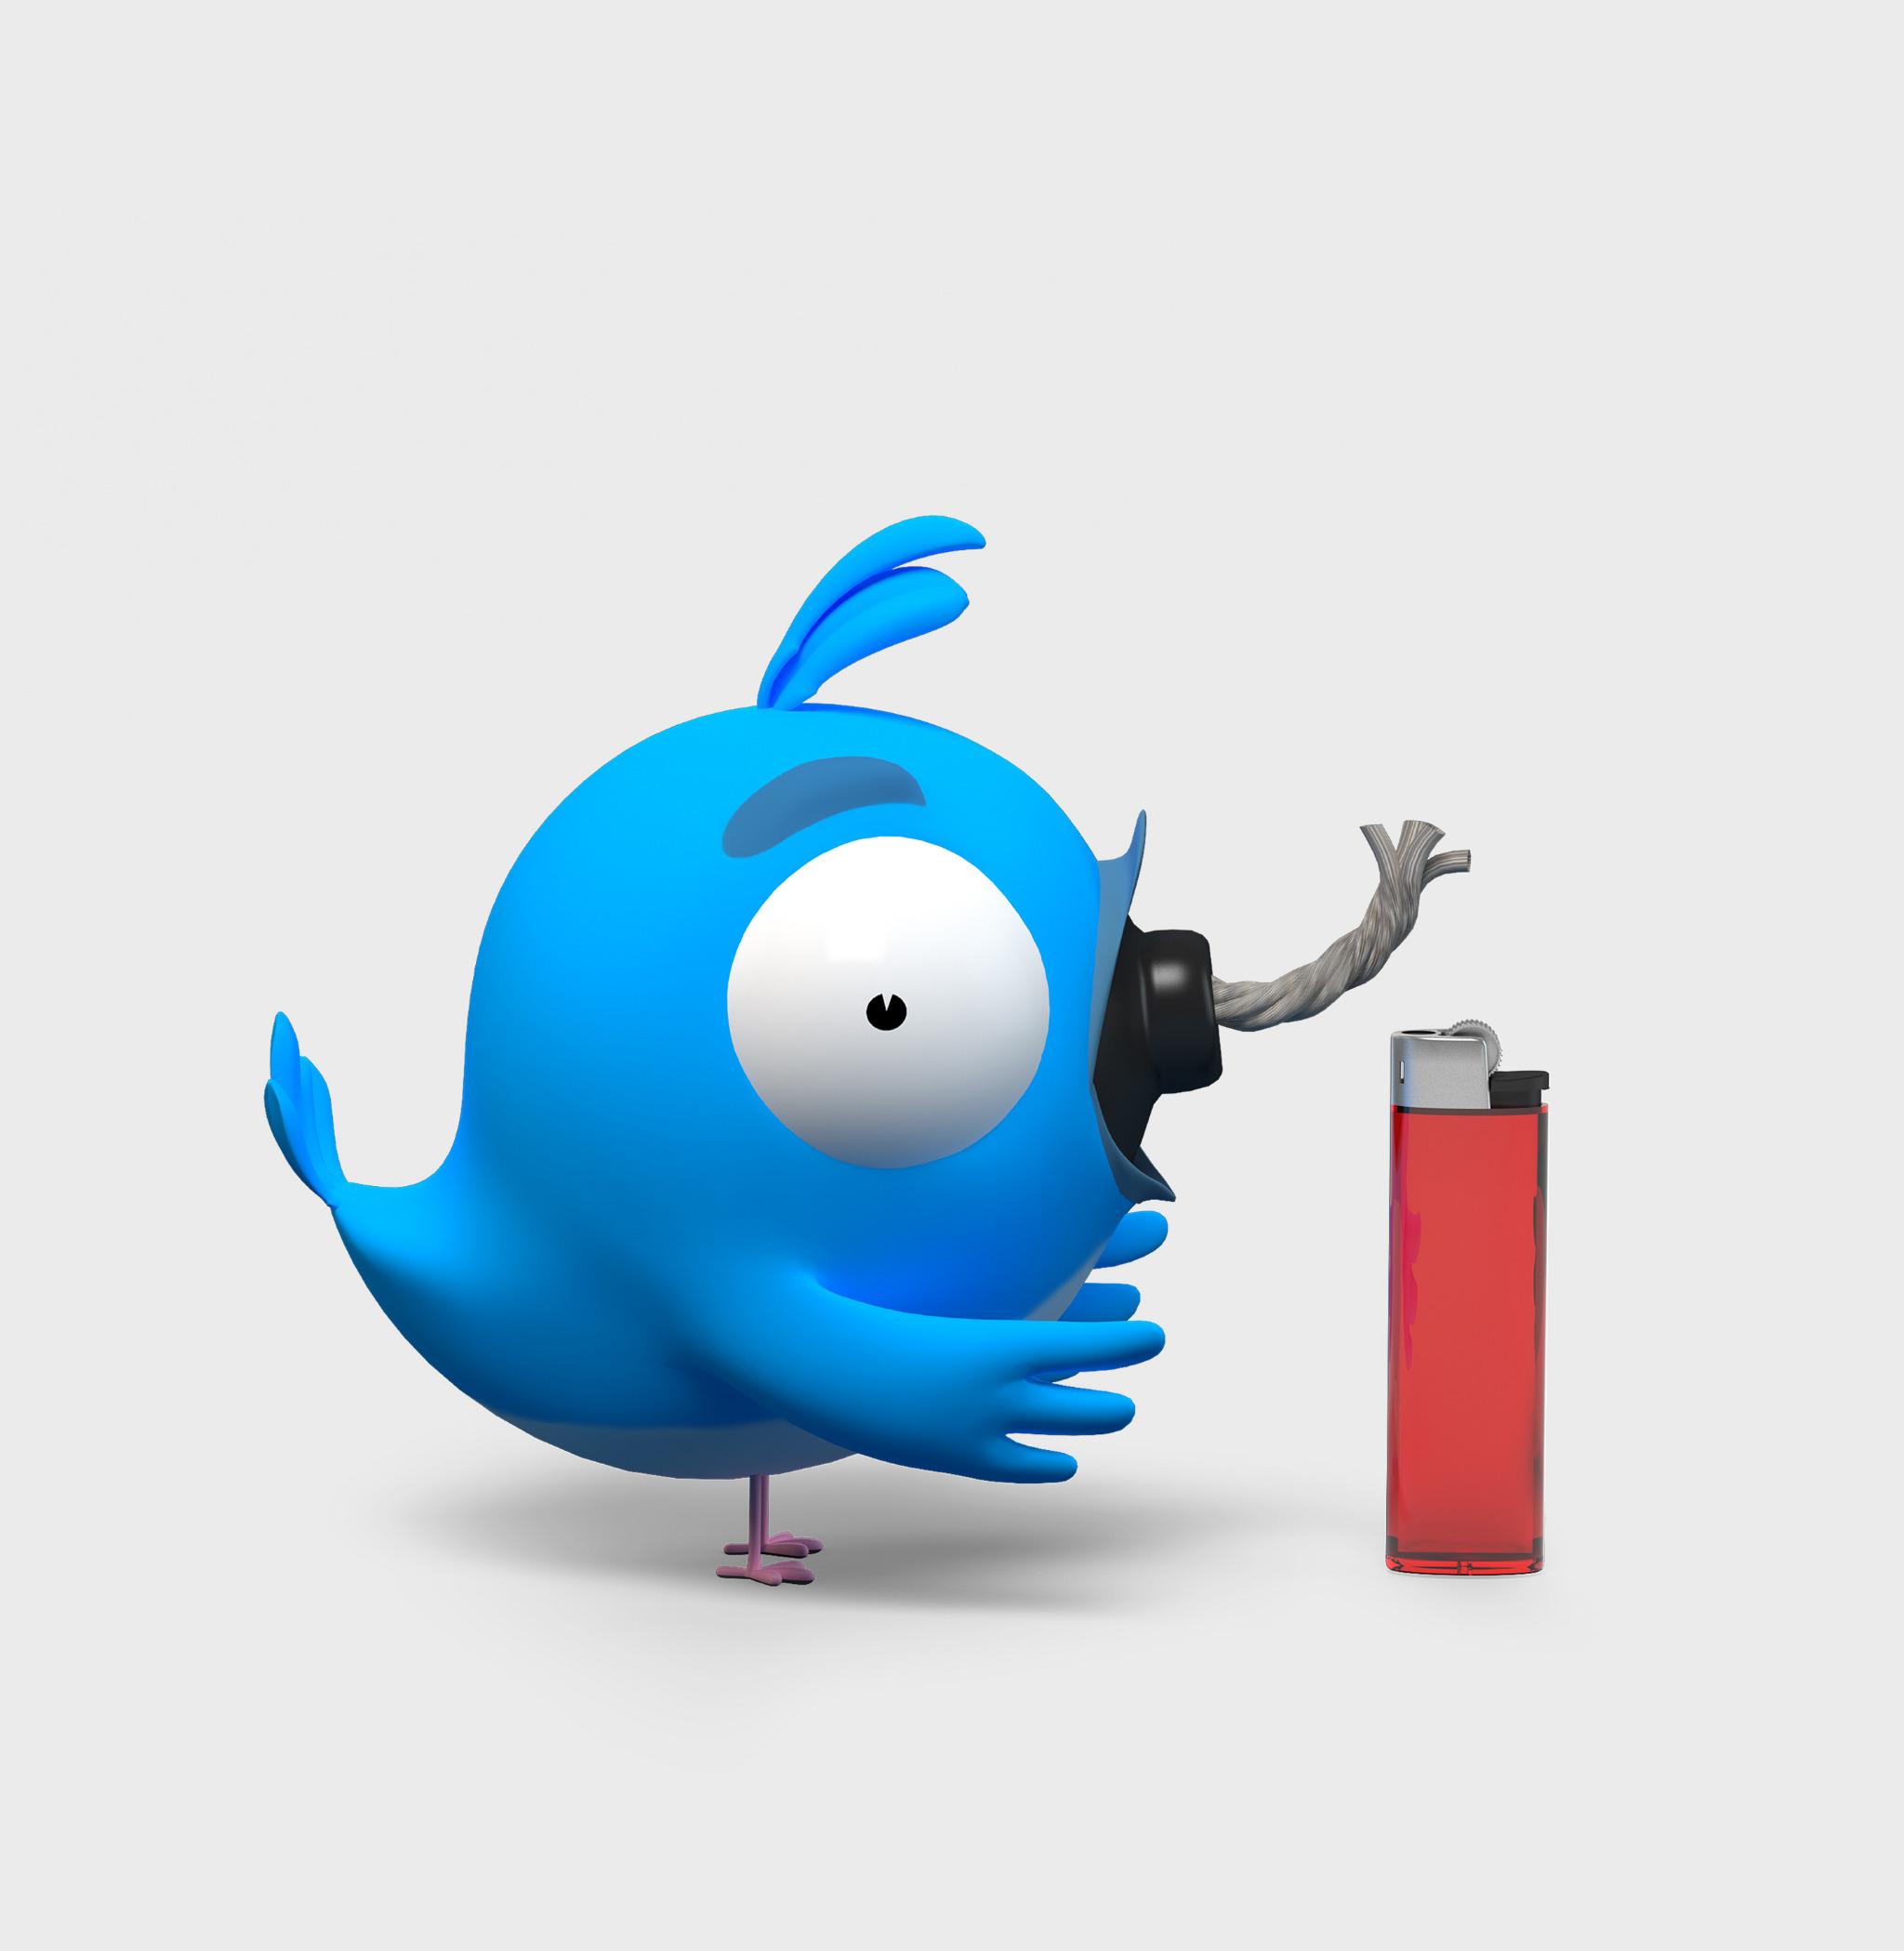 Twitter-Bird-Bloomberg-Businessweek-Boombastic_o.jpg